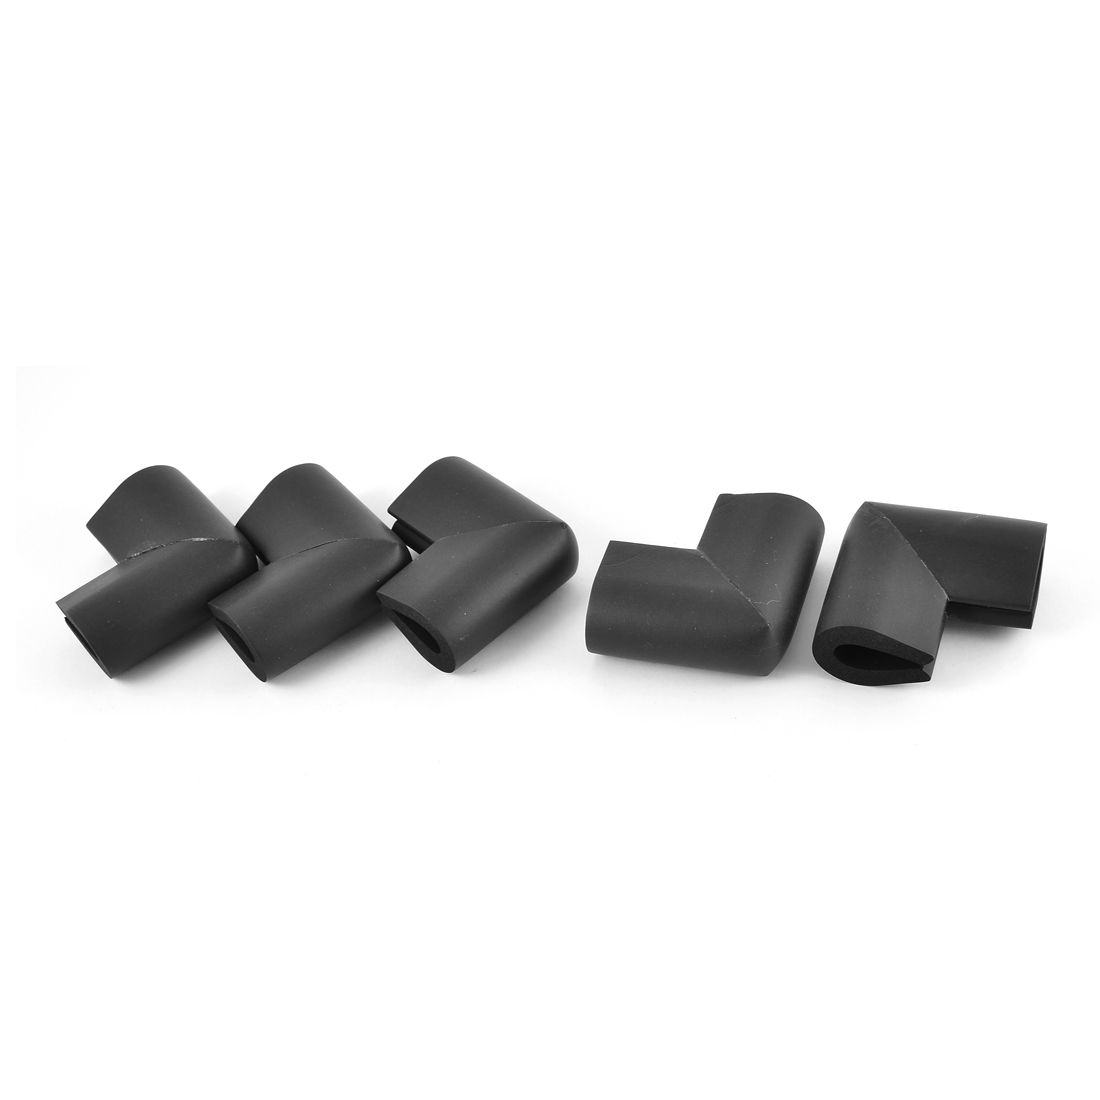 U Shape Corner Guard Home Furniture Edge Protector Cushion Black 5 Pcs